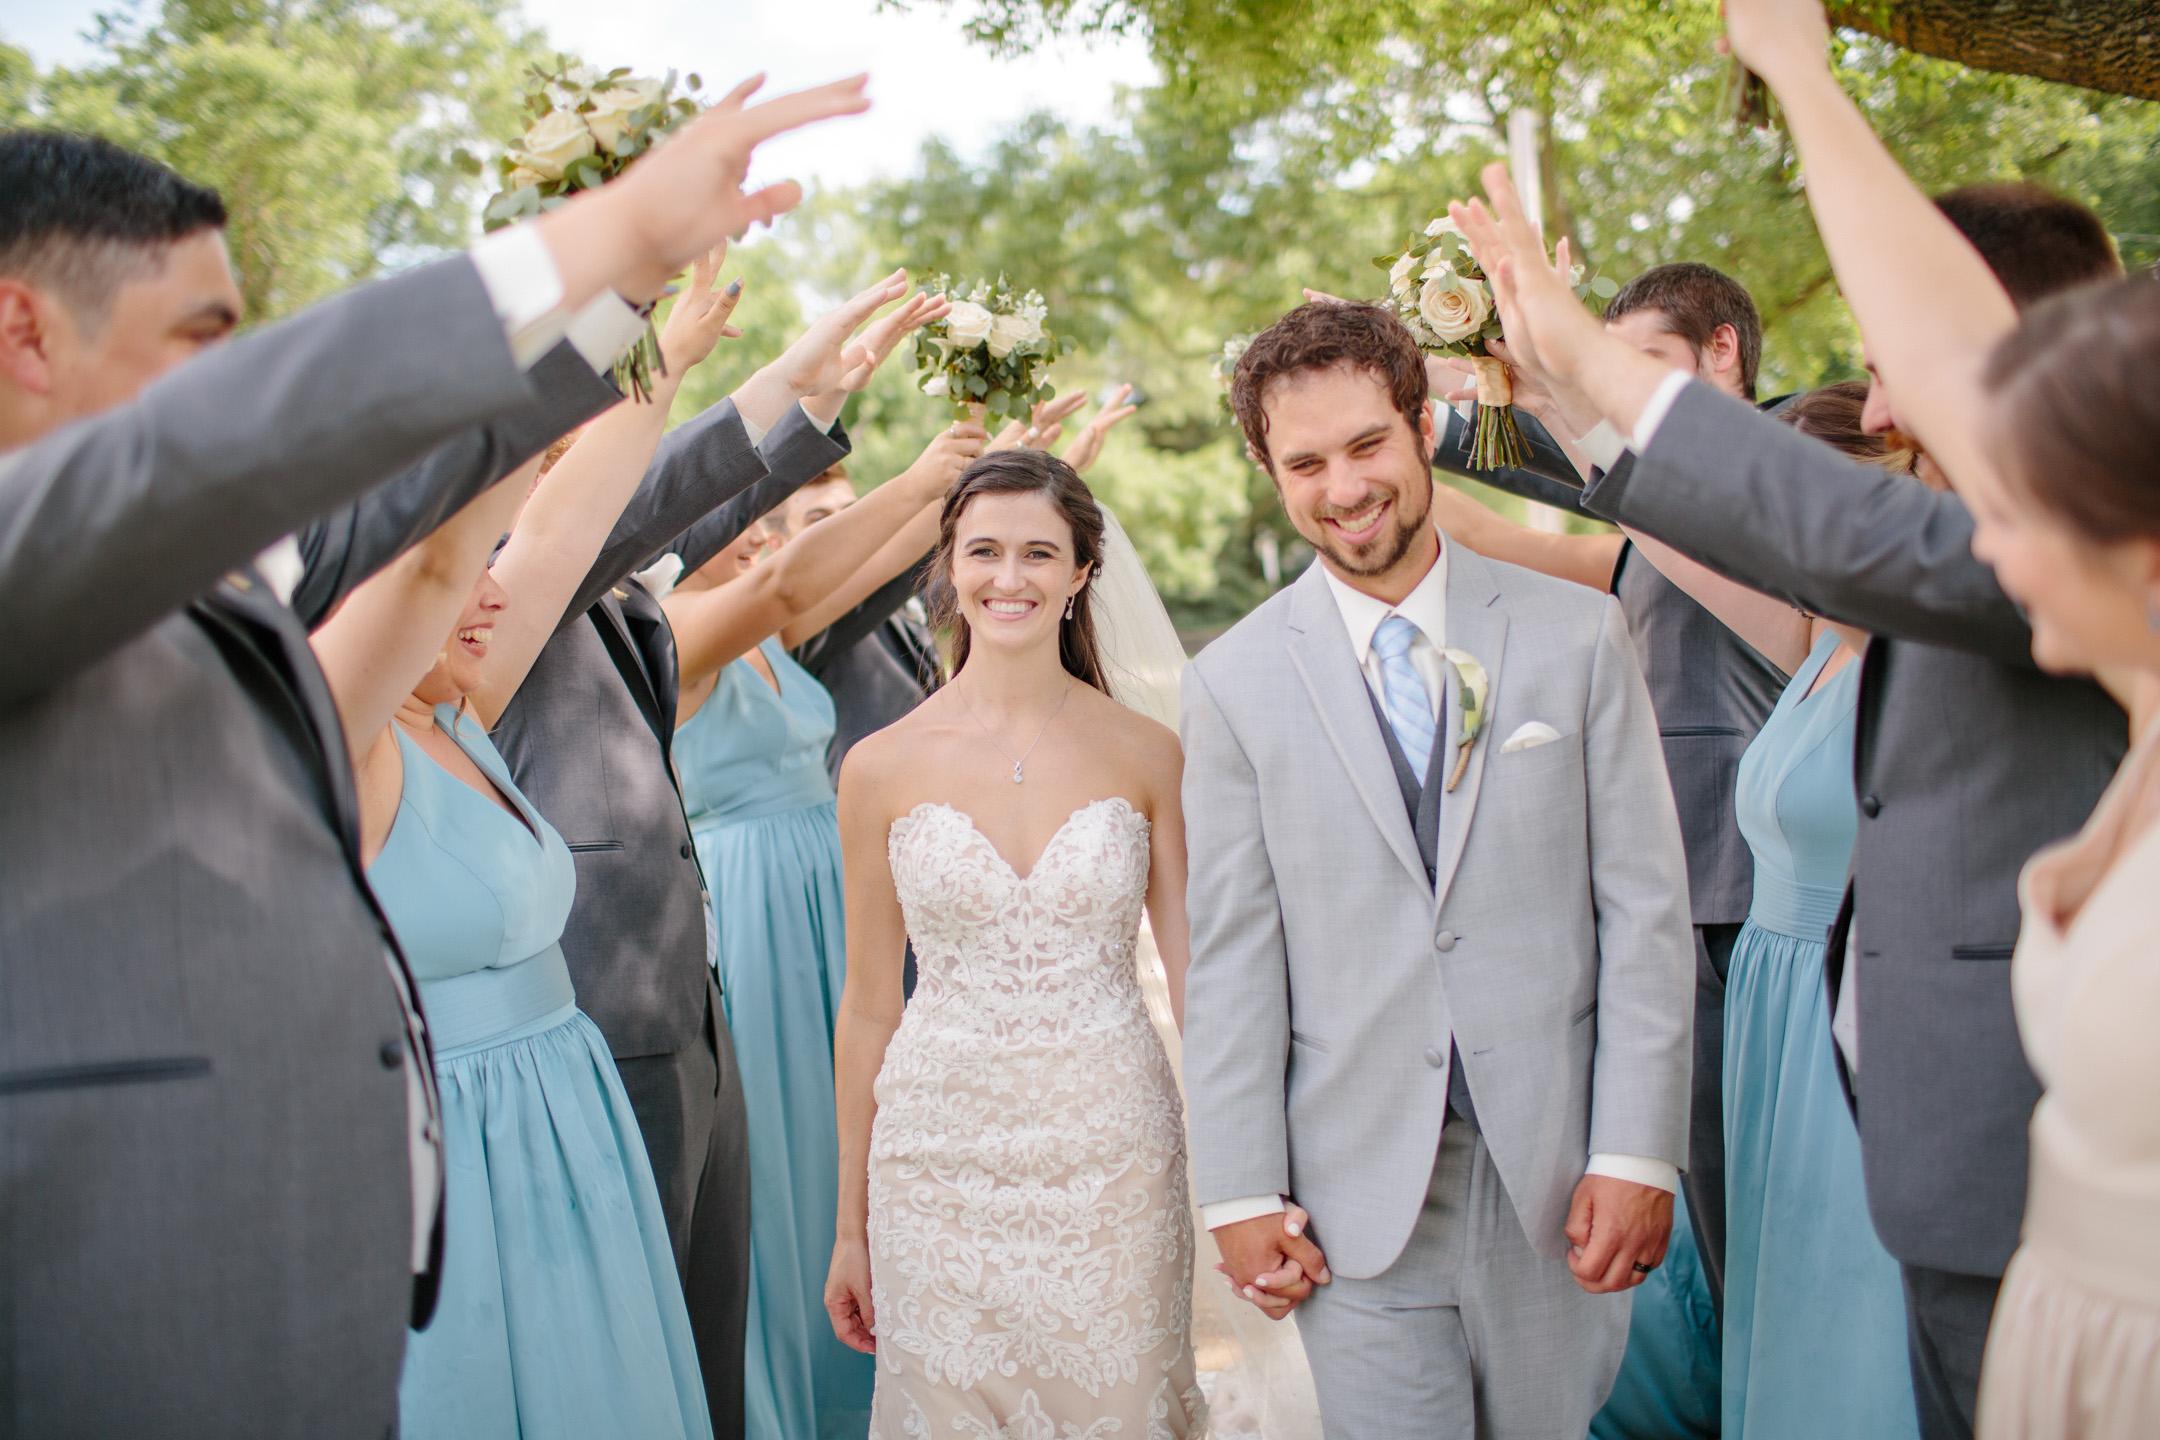 central des Moines iowa wedding photographers Amelia Renee